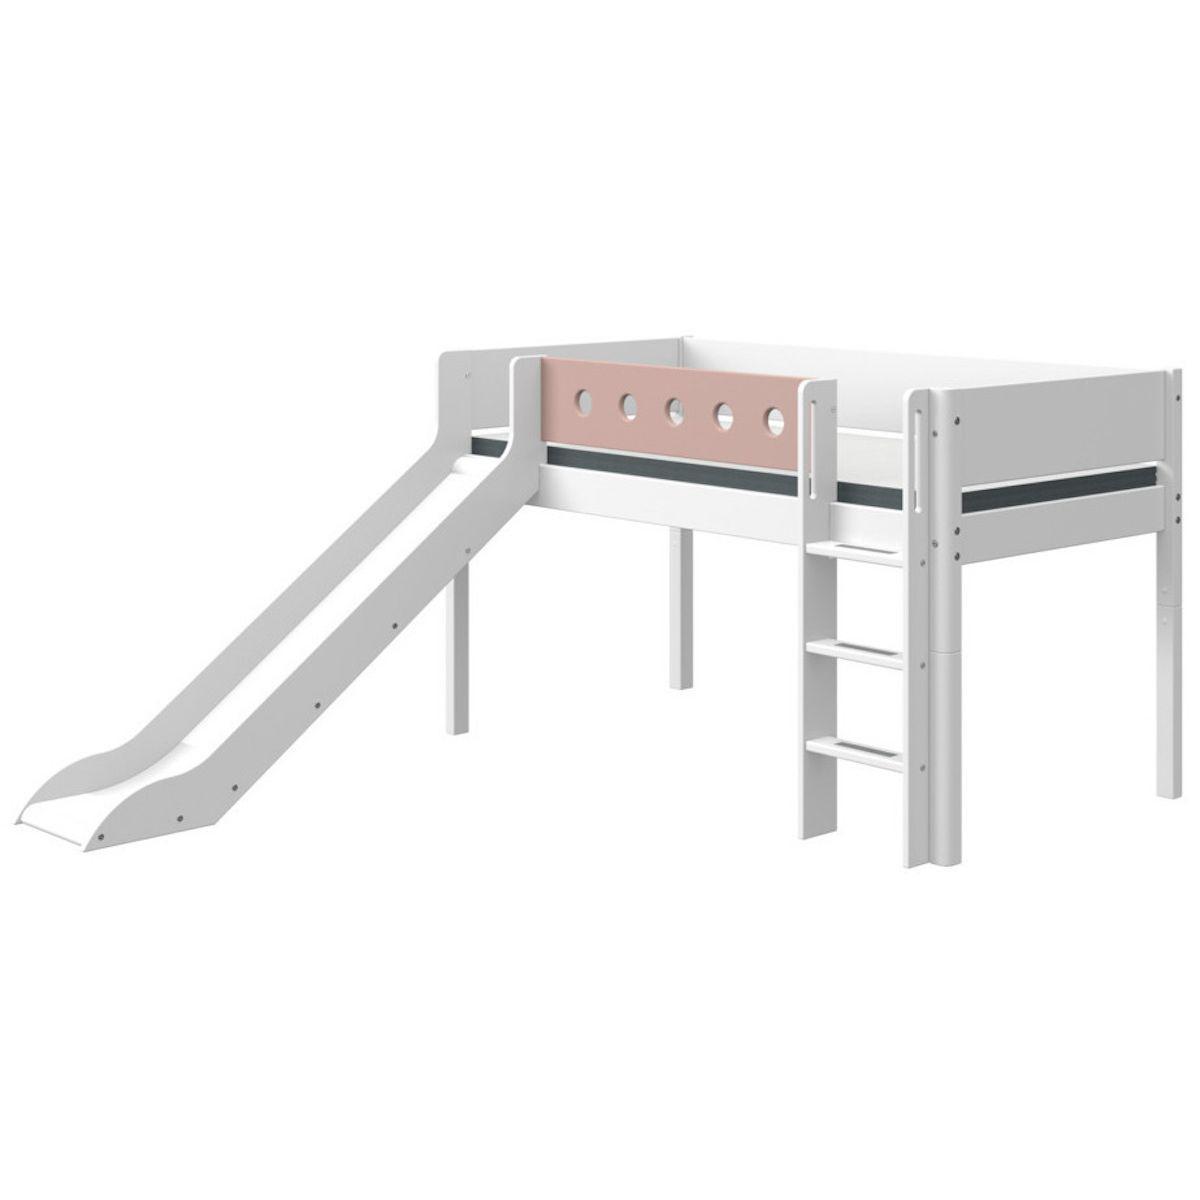 Cama media alta 90x190cm escalera recta-tobogán WHITE Flexa blanco-rosa claro